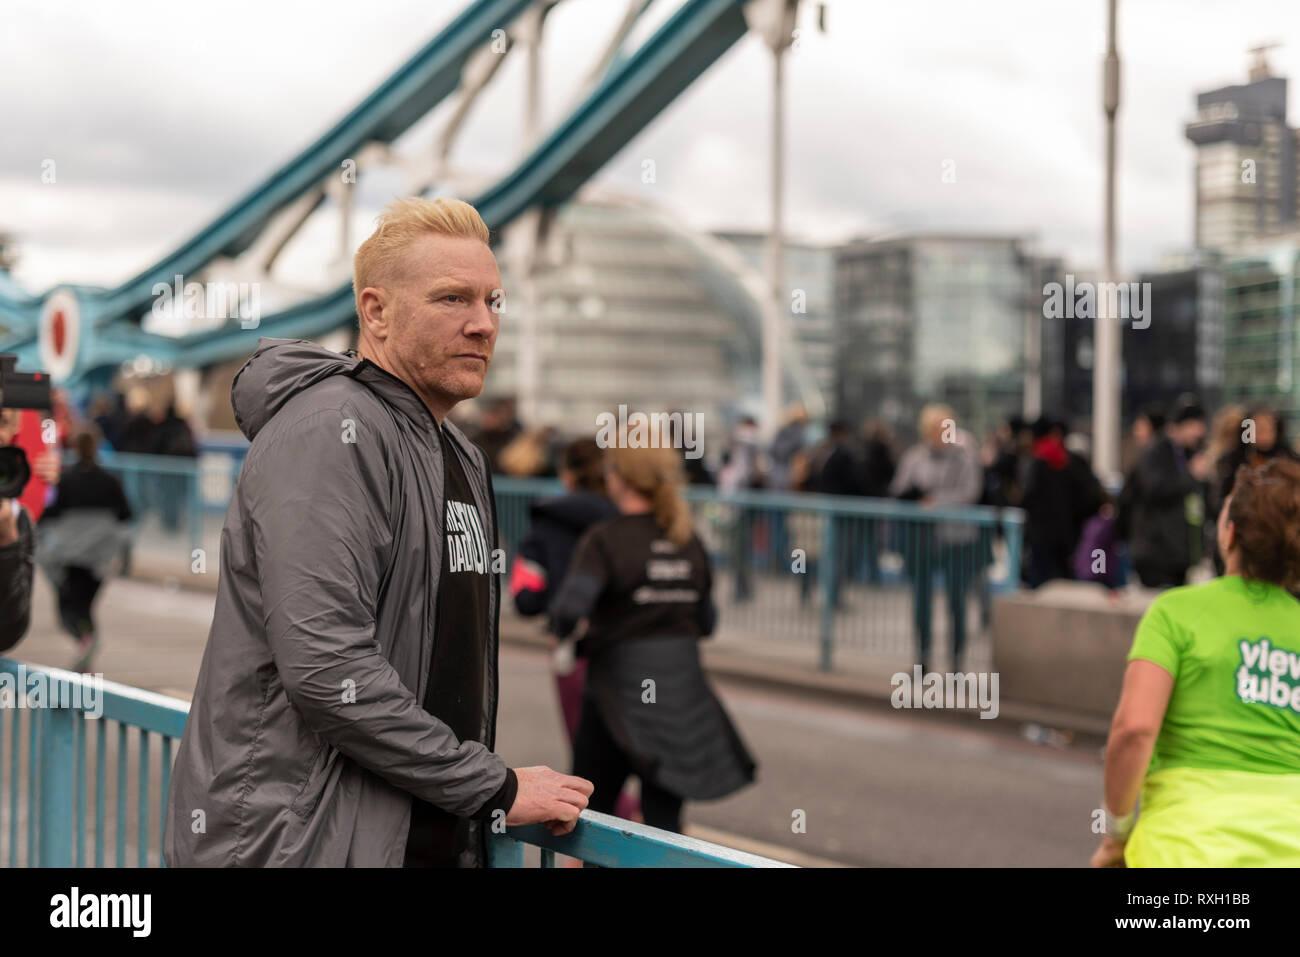 Athlet Iwan Thomas beobachten die Läufer in die Vitalität große Hälfte Halbmarathon crossing Tower Bridge, London, UK. Stockbild